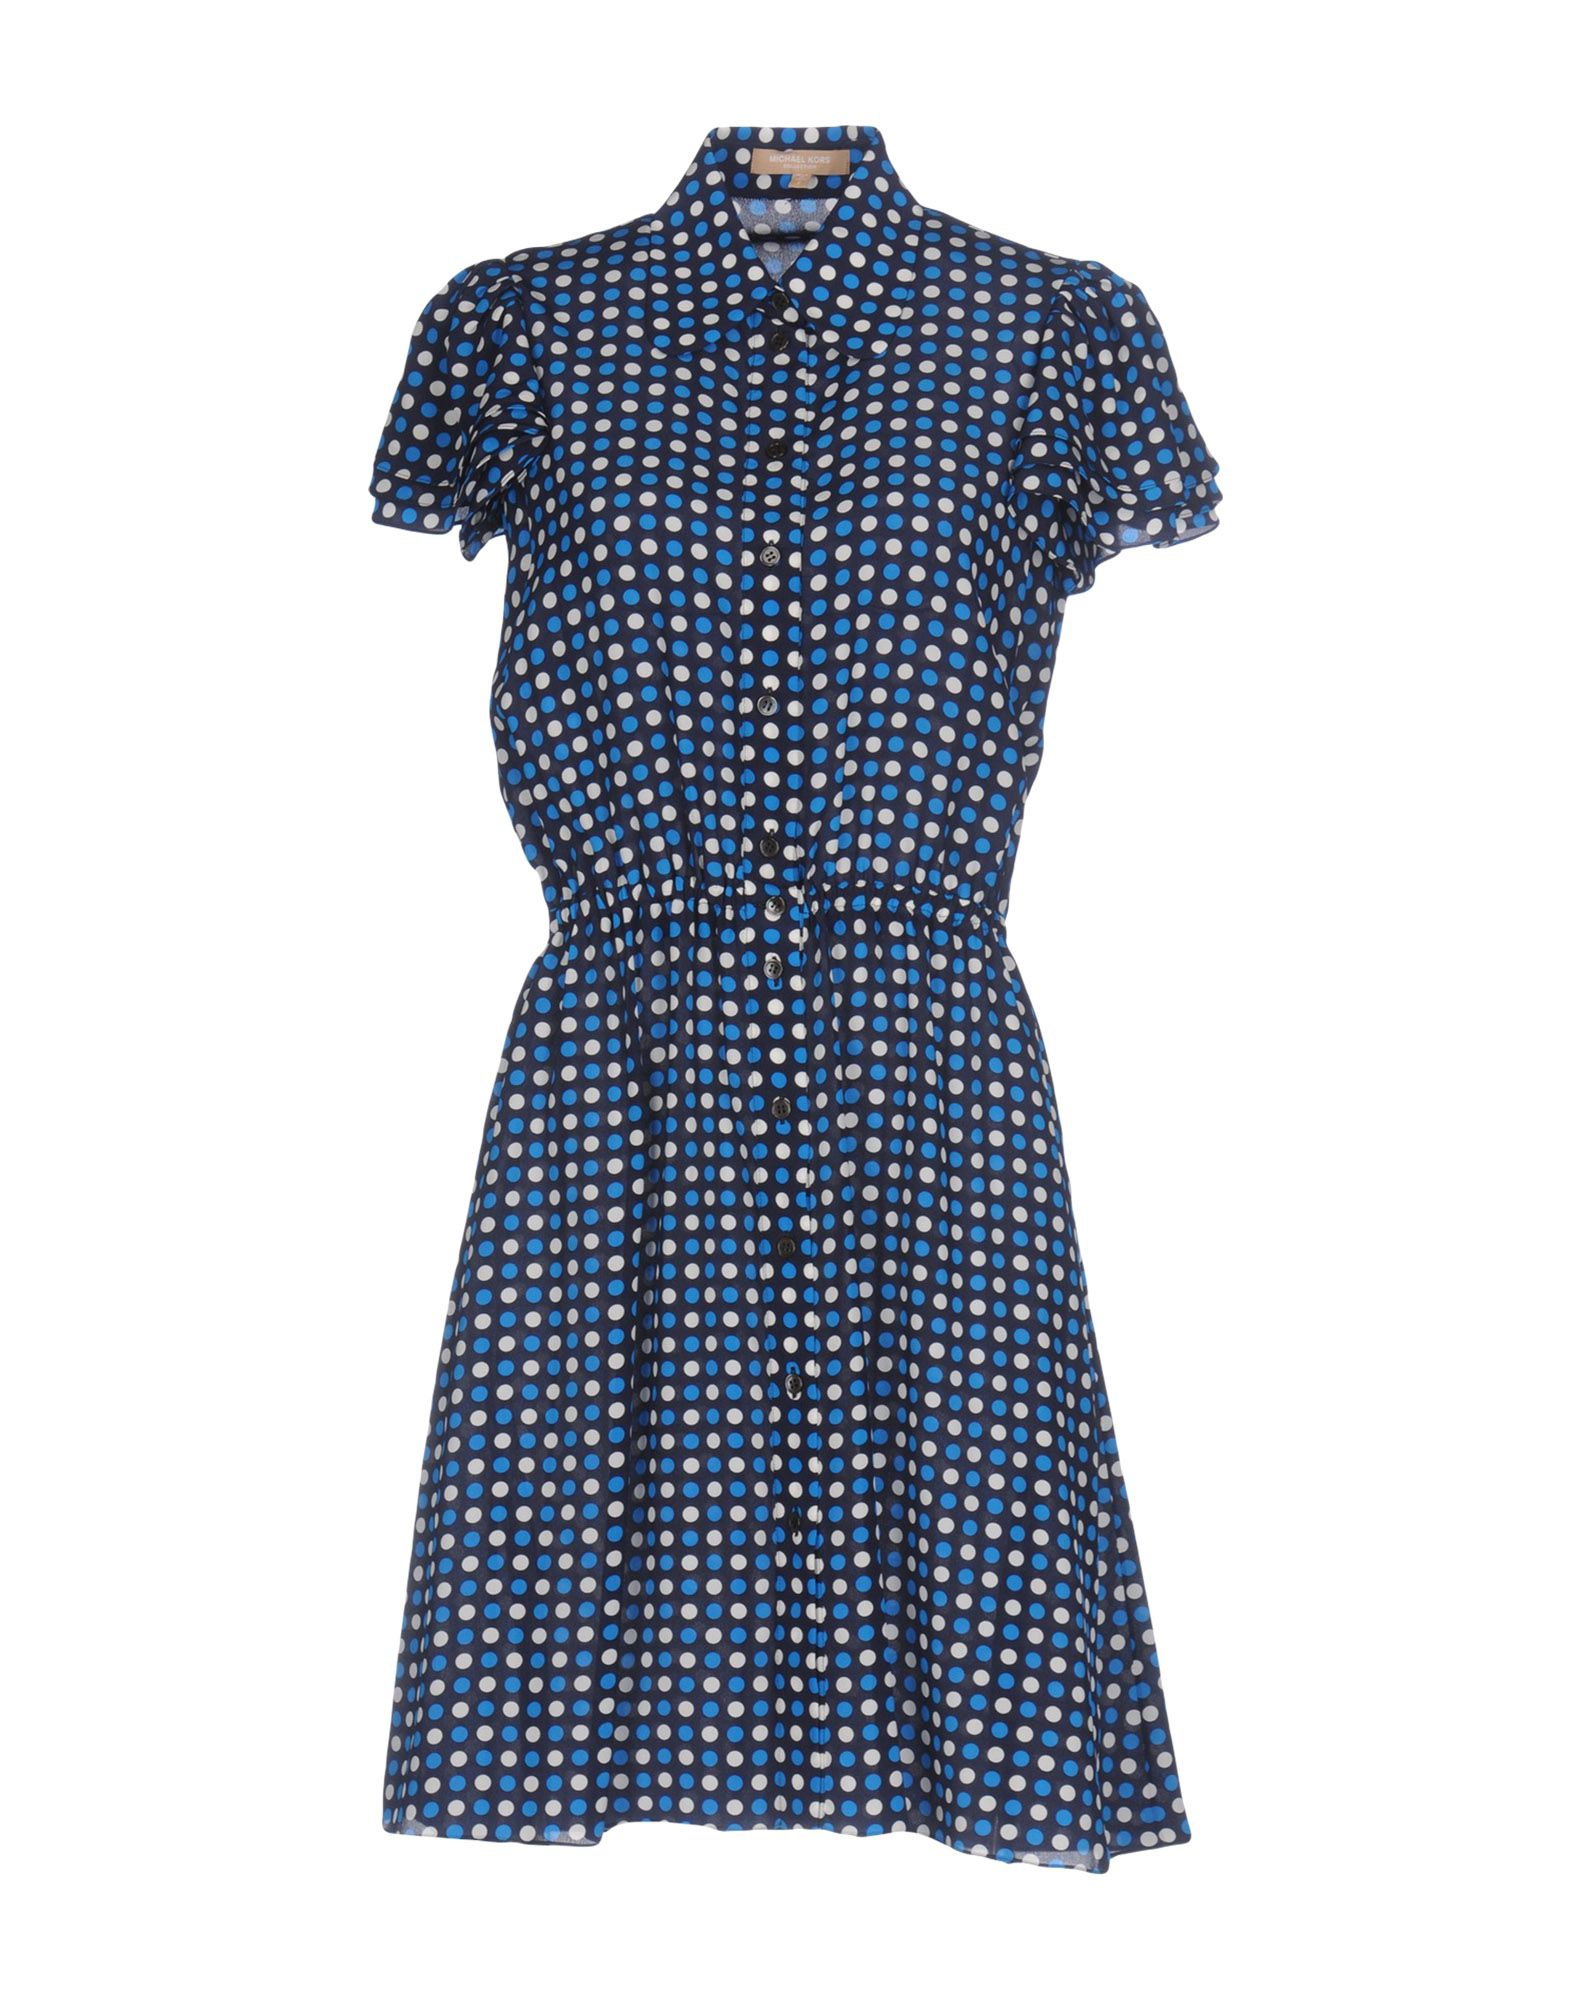 MICHAEL KORS COLLECTION Короткое платье fine collection короткое платье